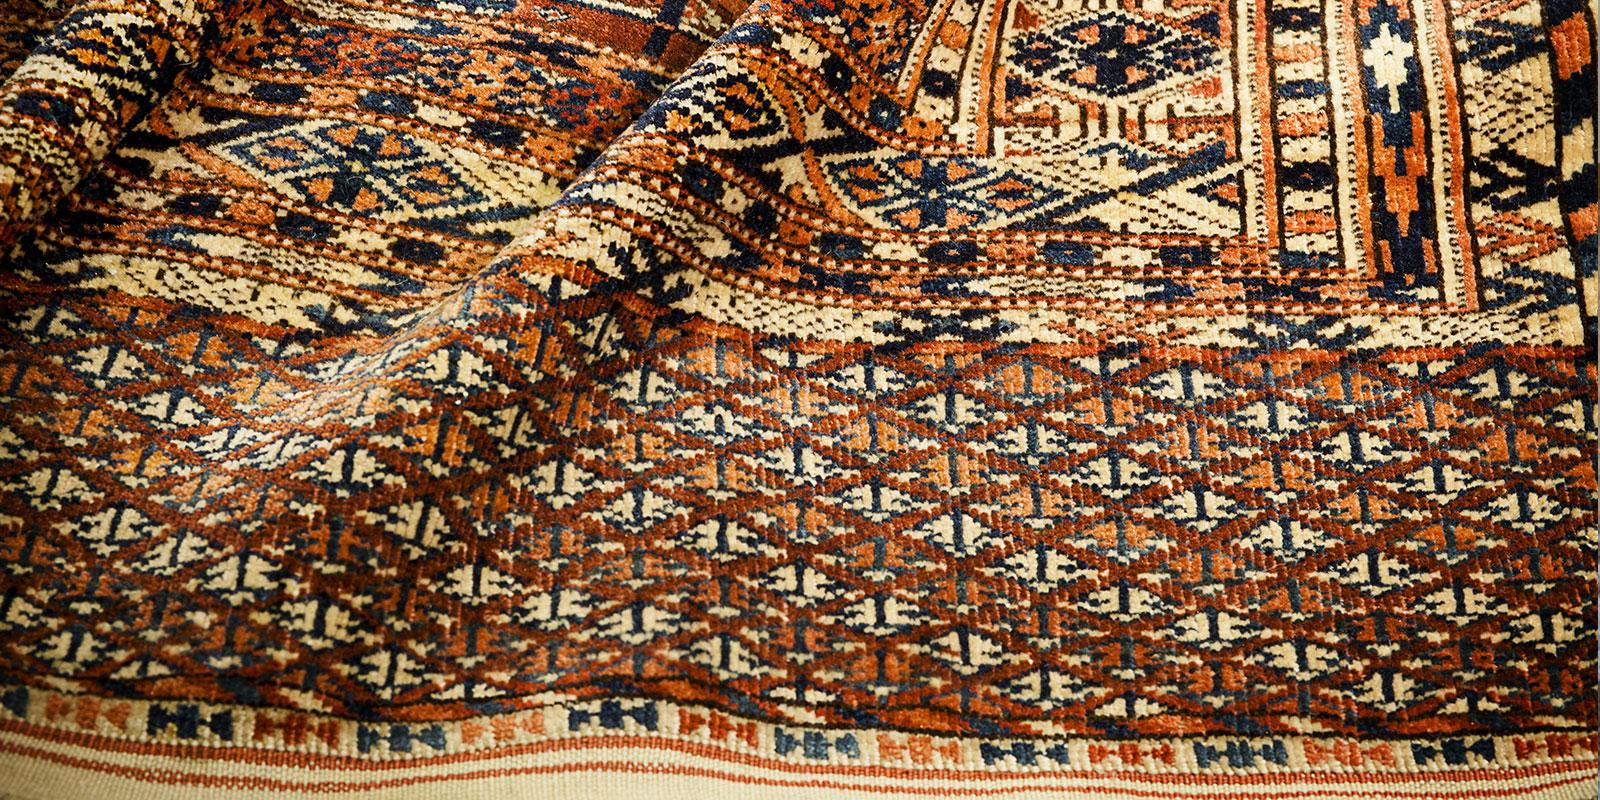 Negozio tappeto Kilim